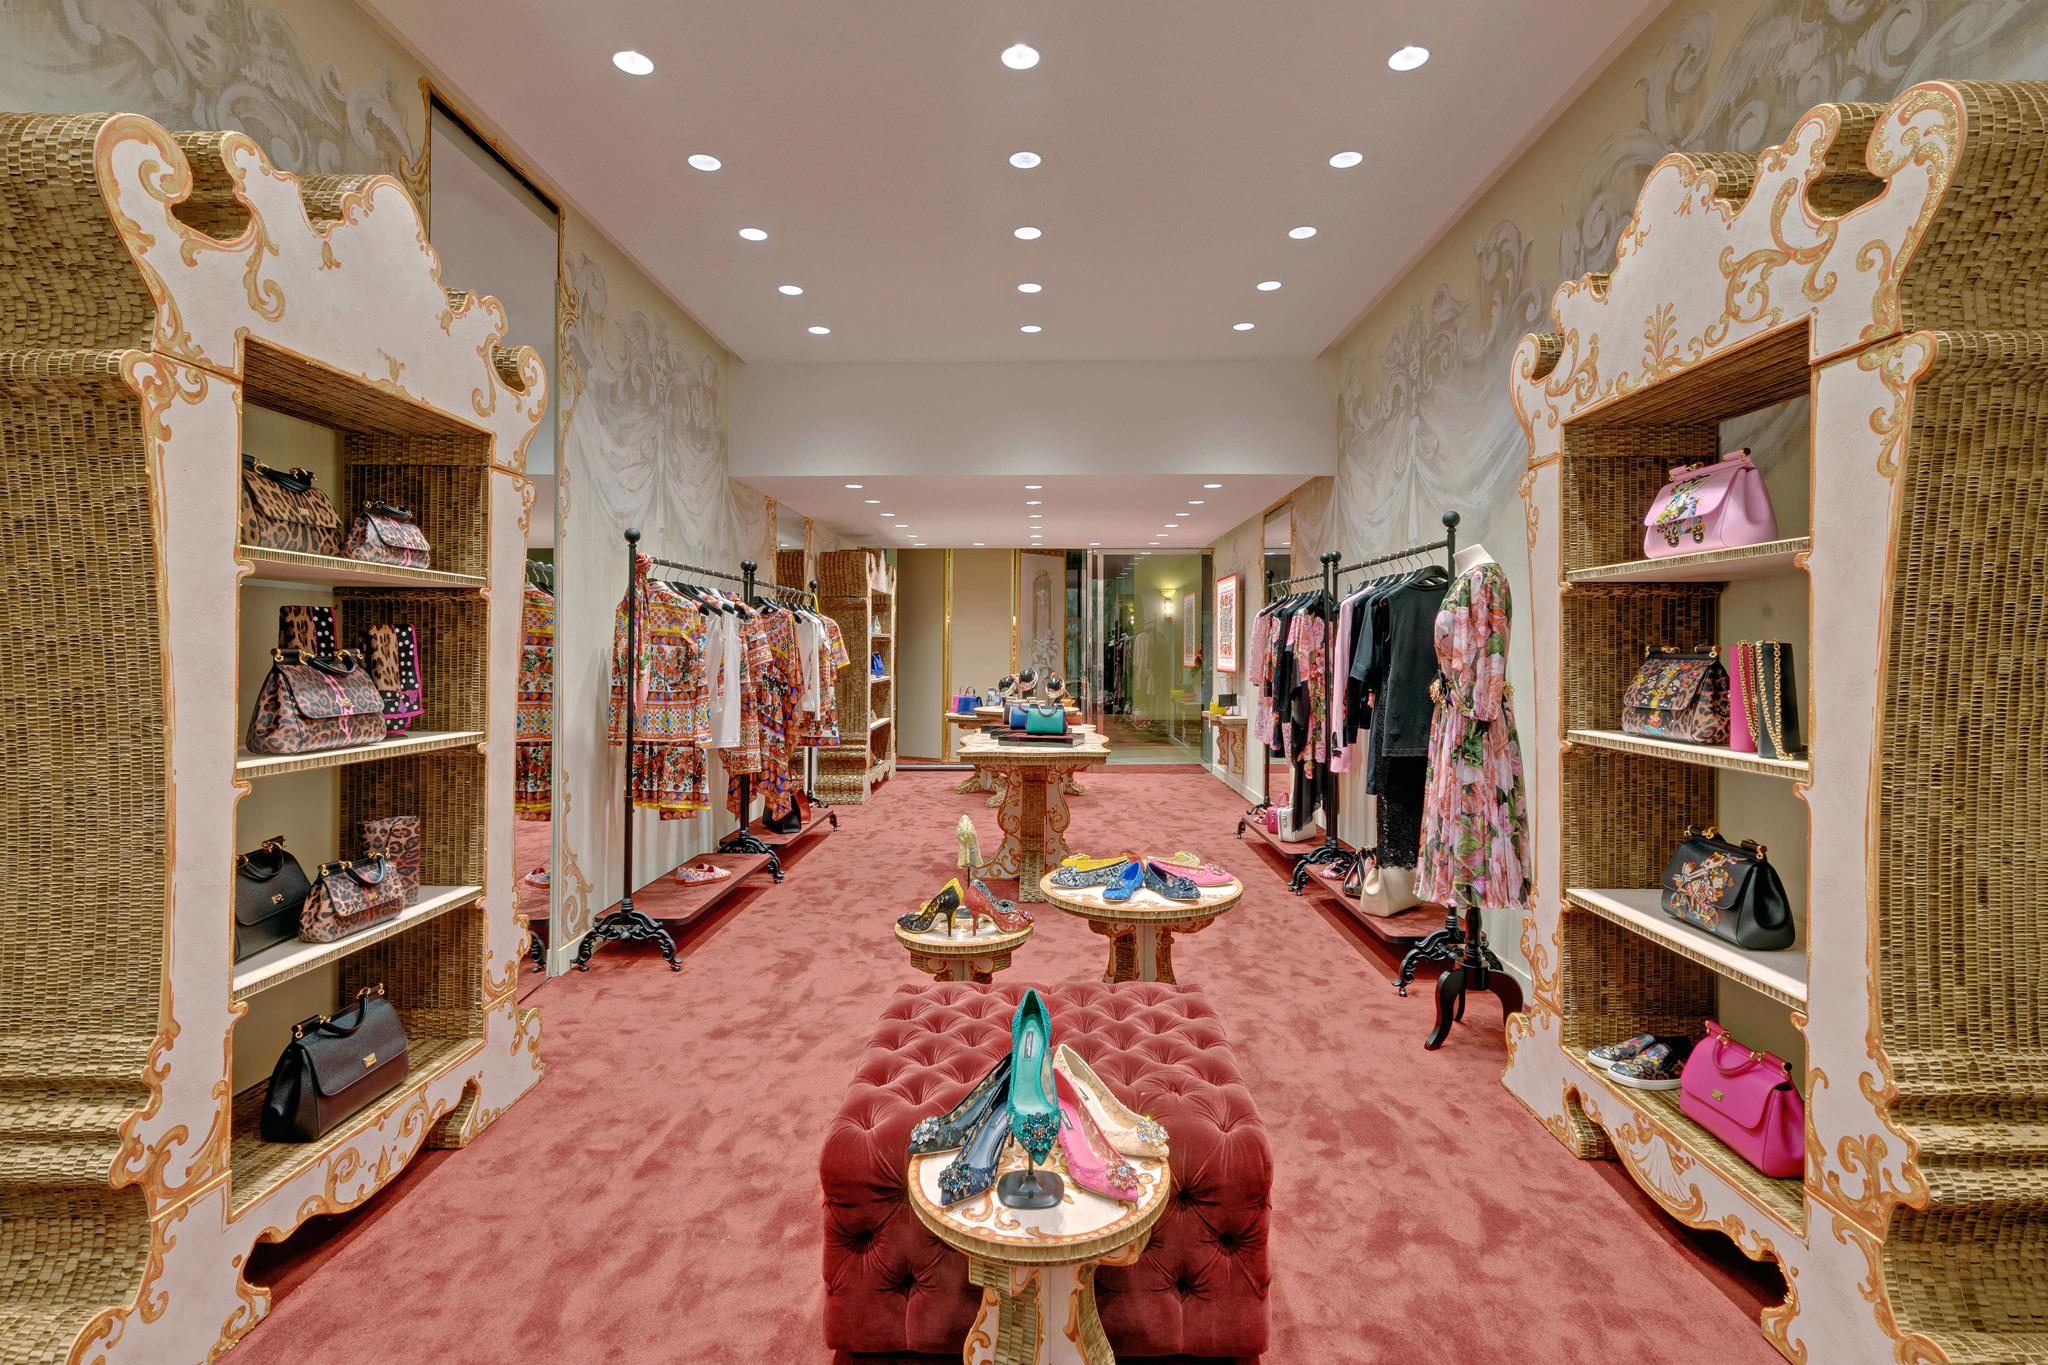 20170123 - Dolce & Gabbana - HCM - Commercial - Interior - Store - Retouch 0006.jpg